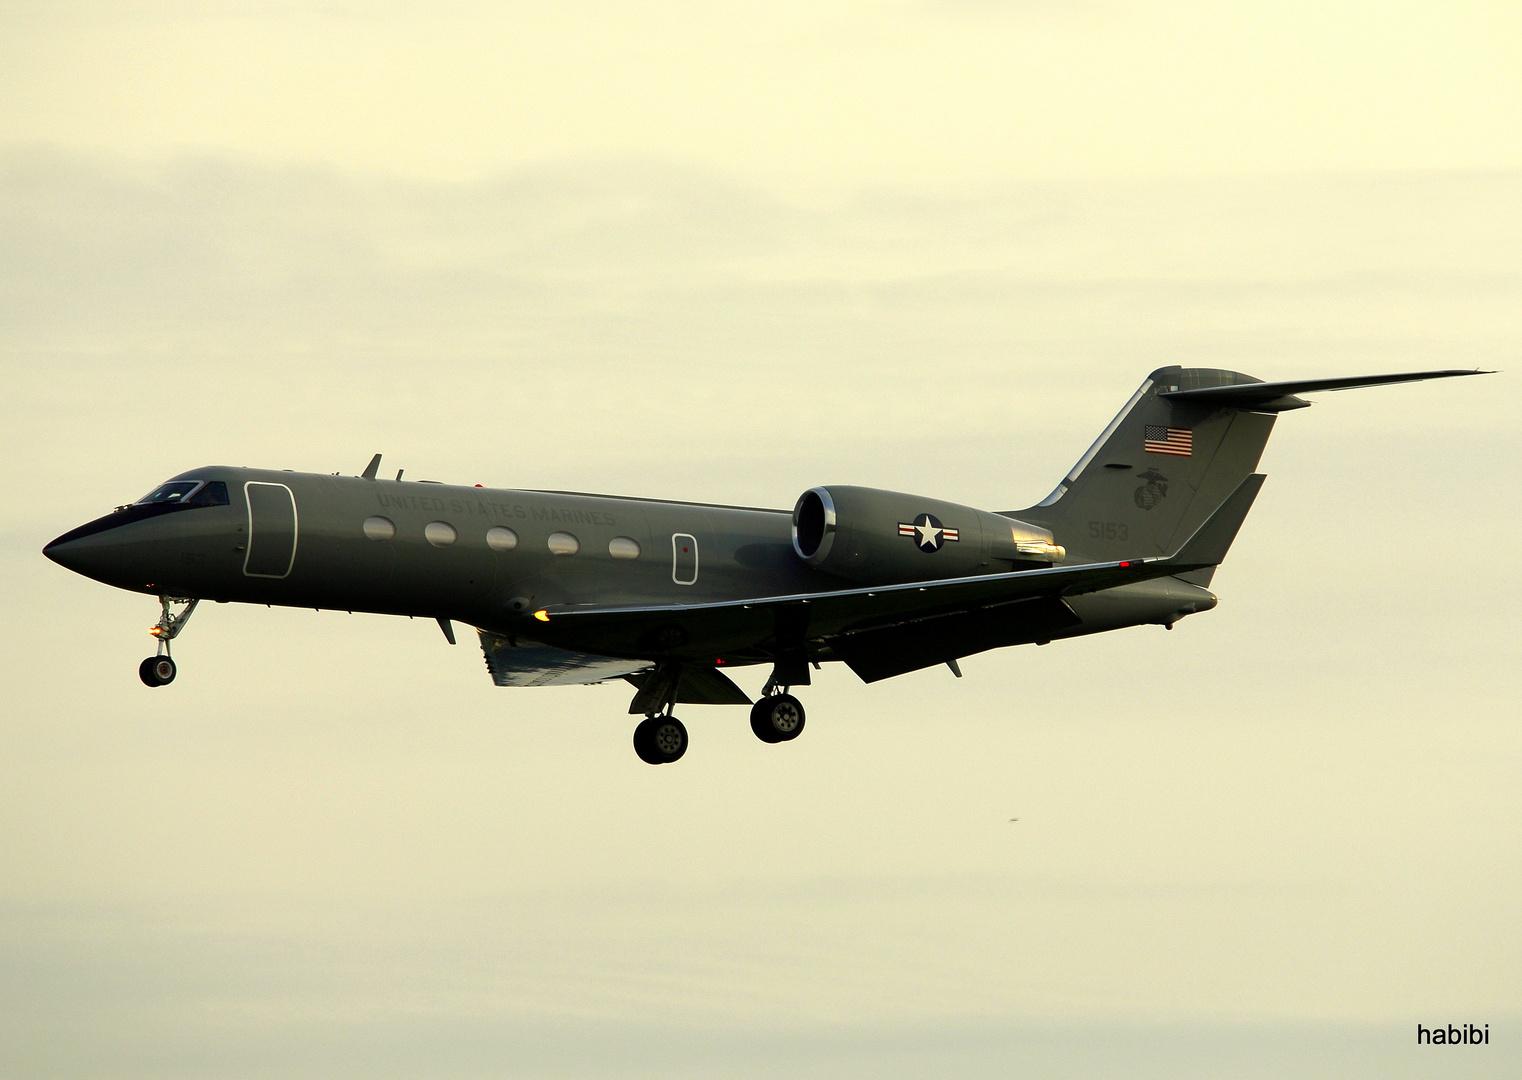 Reg 5153/Gulfstream III